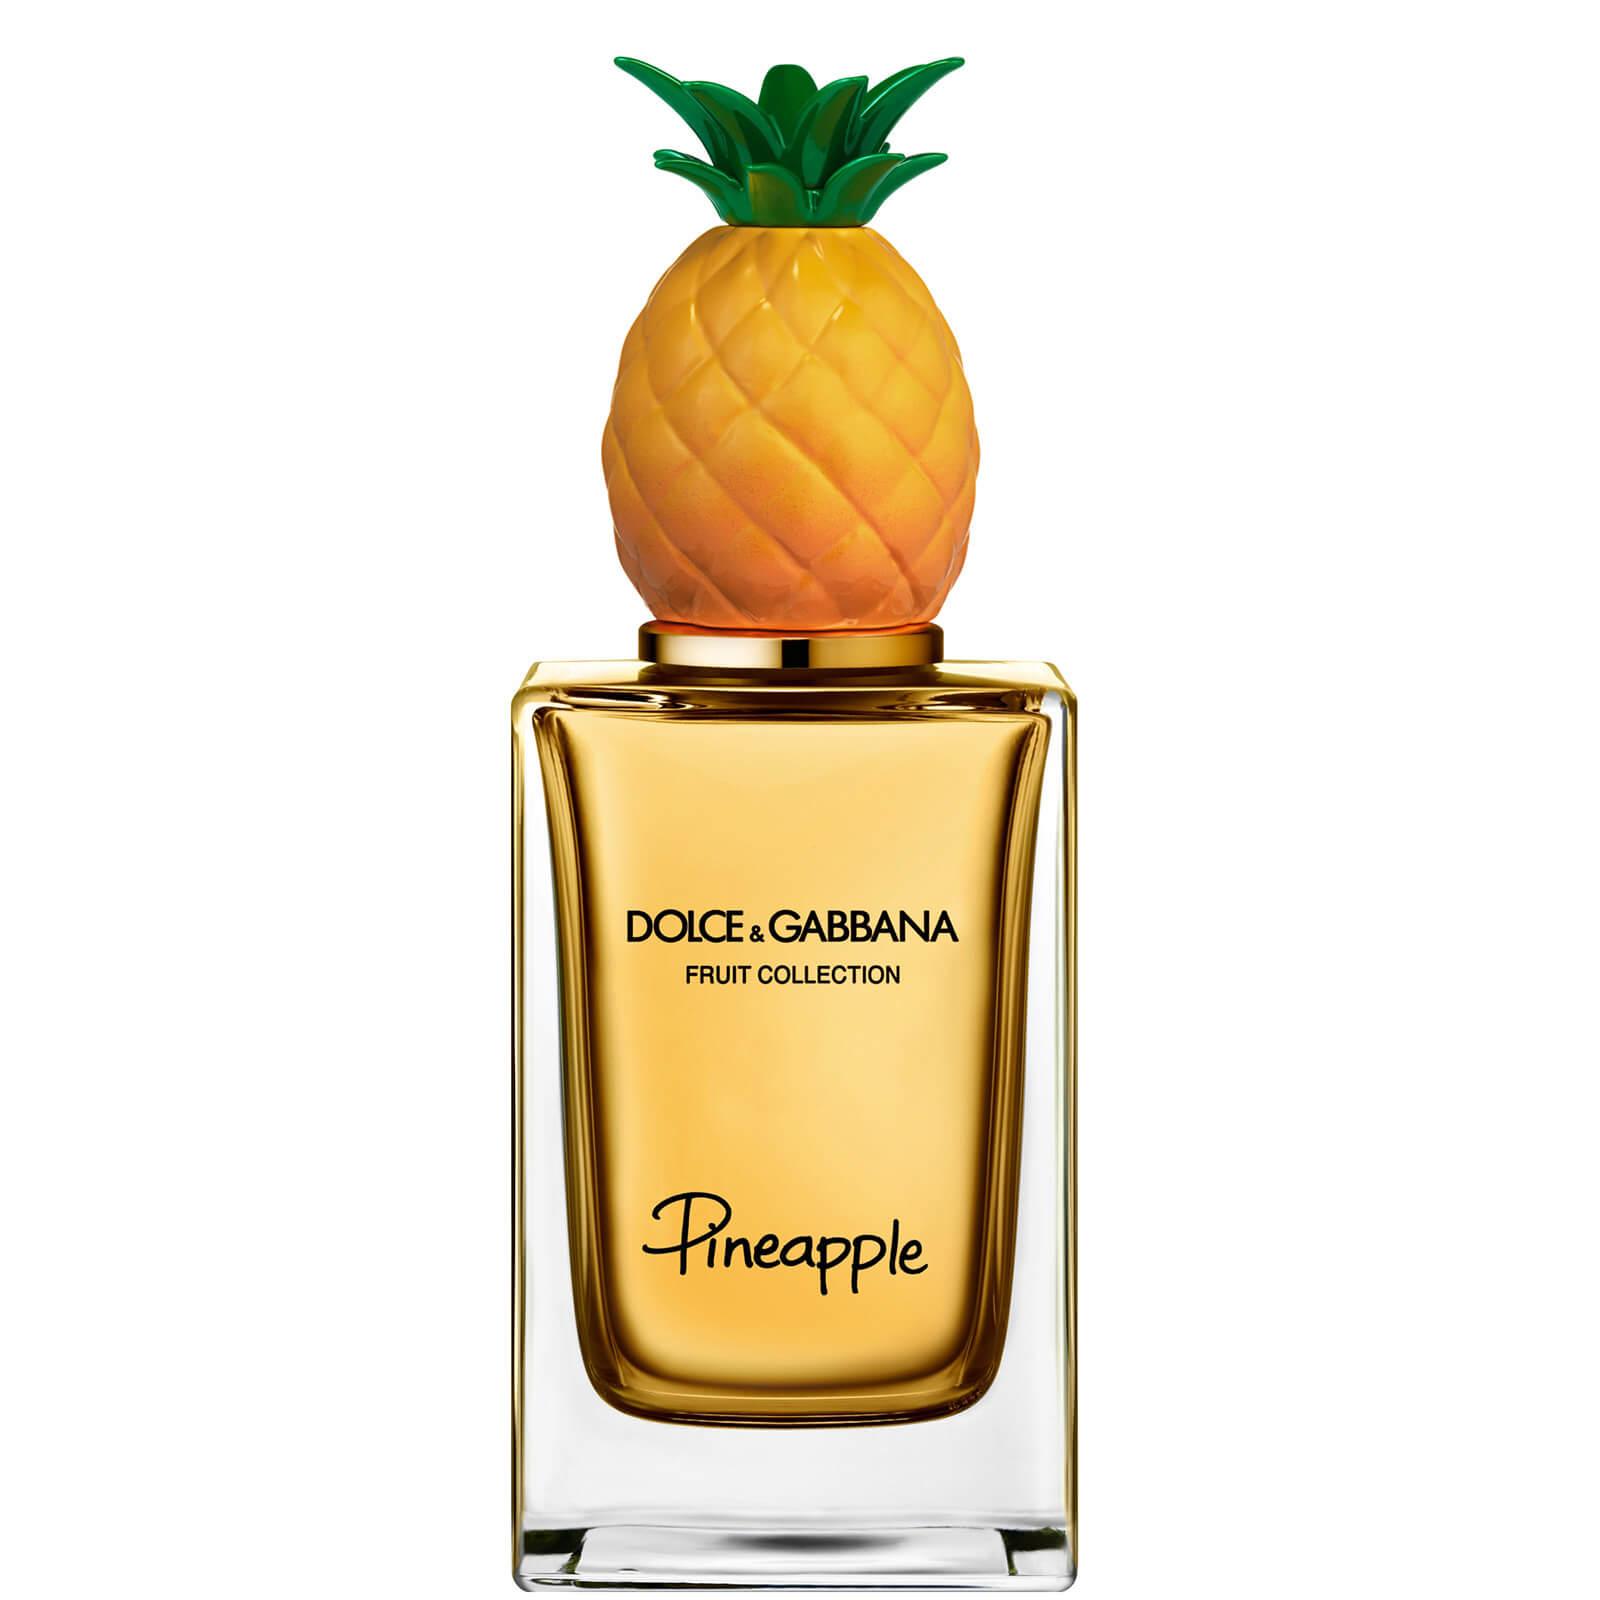 Купить Dolce&Gabbana Fruit Collection Pineapple Eau de Toilette 150ml